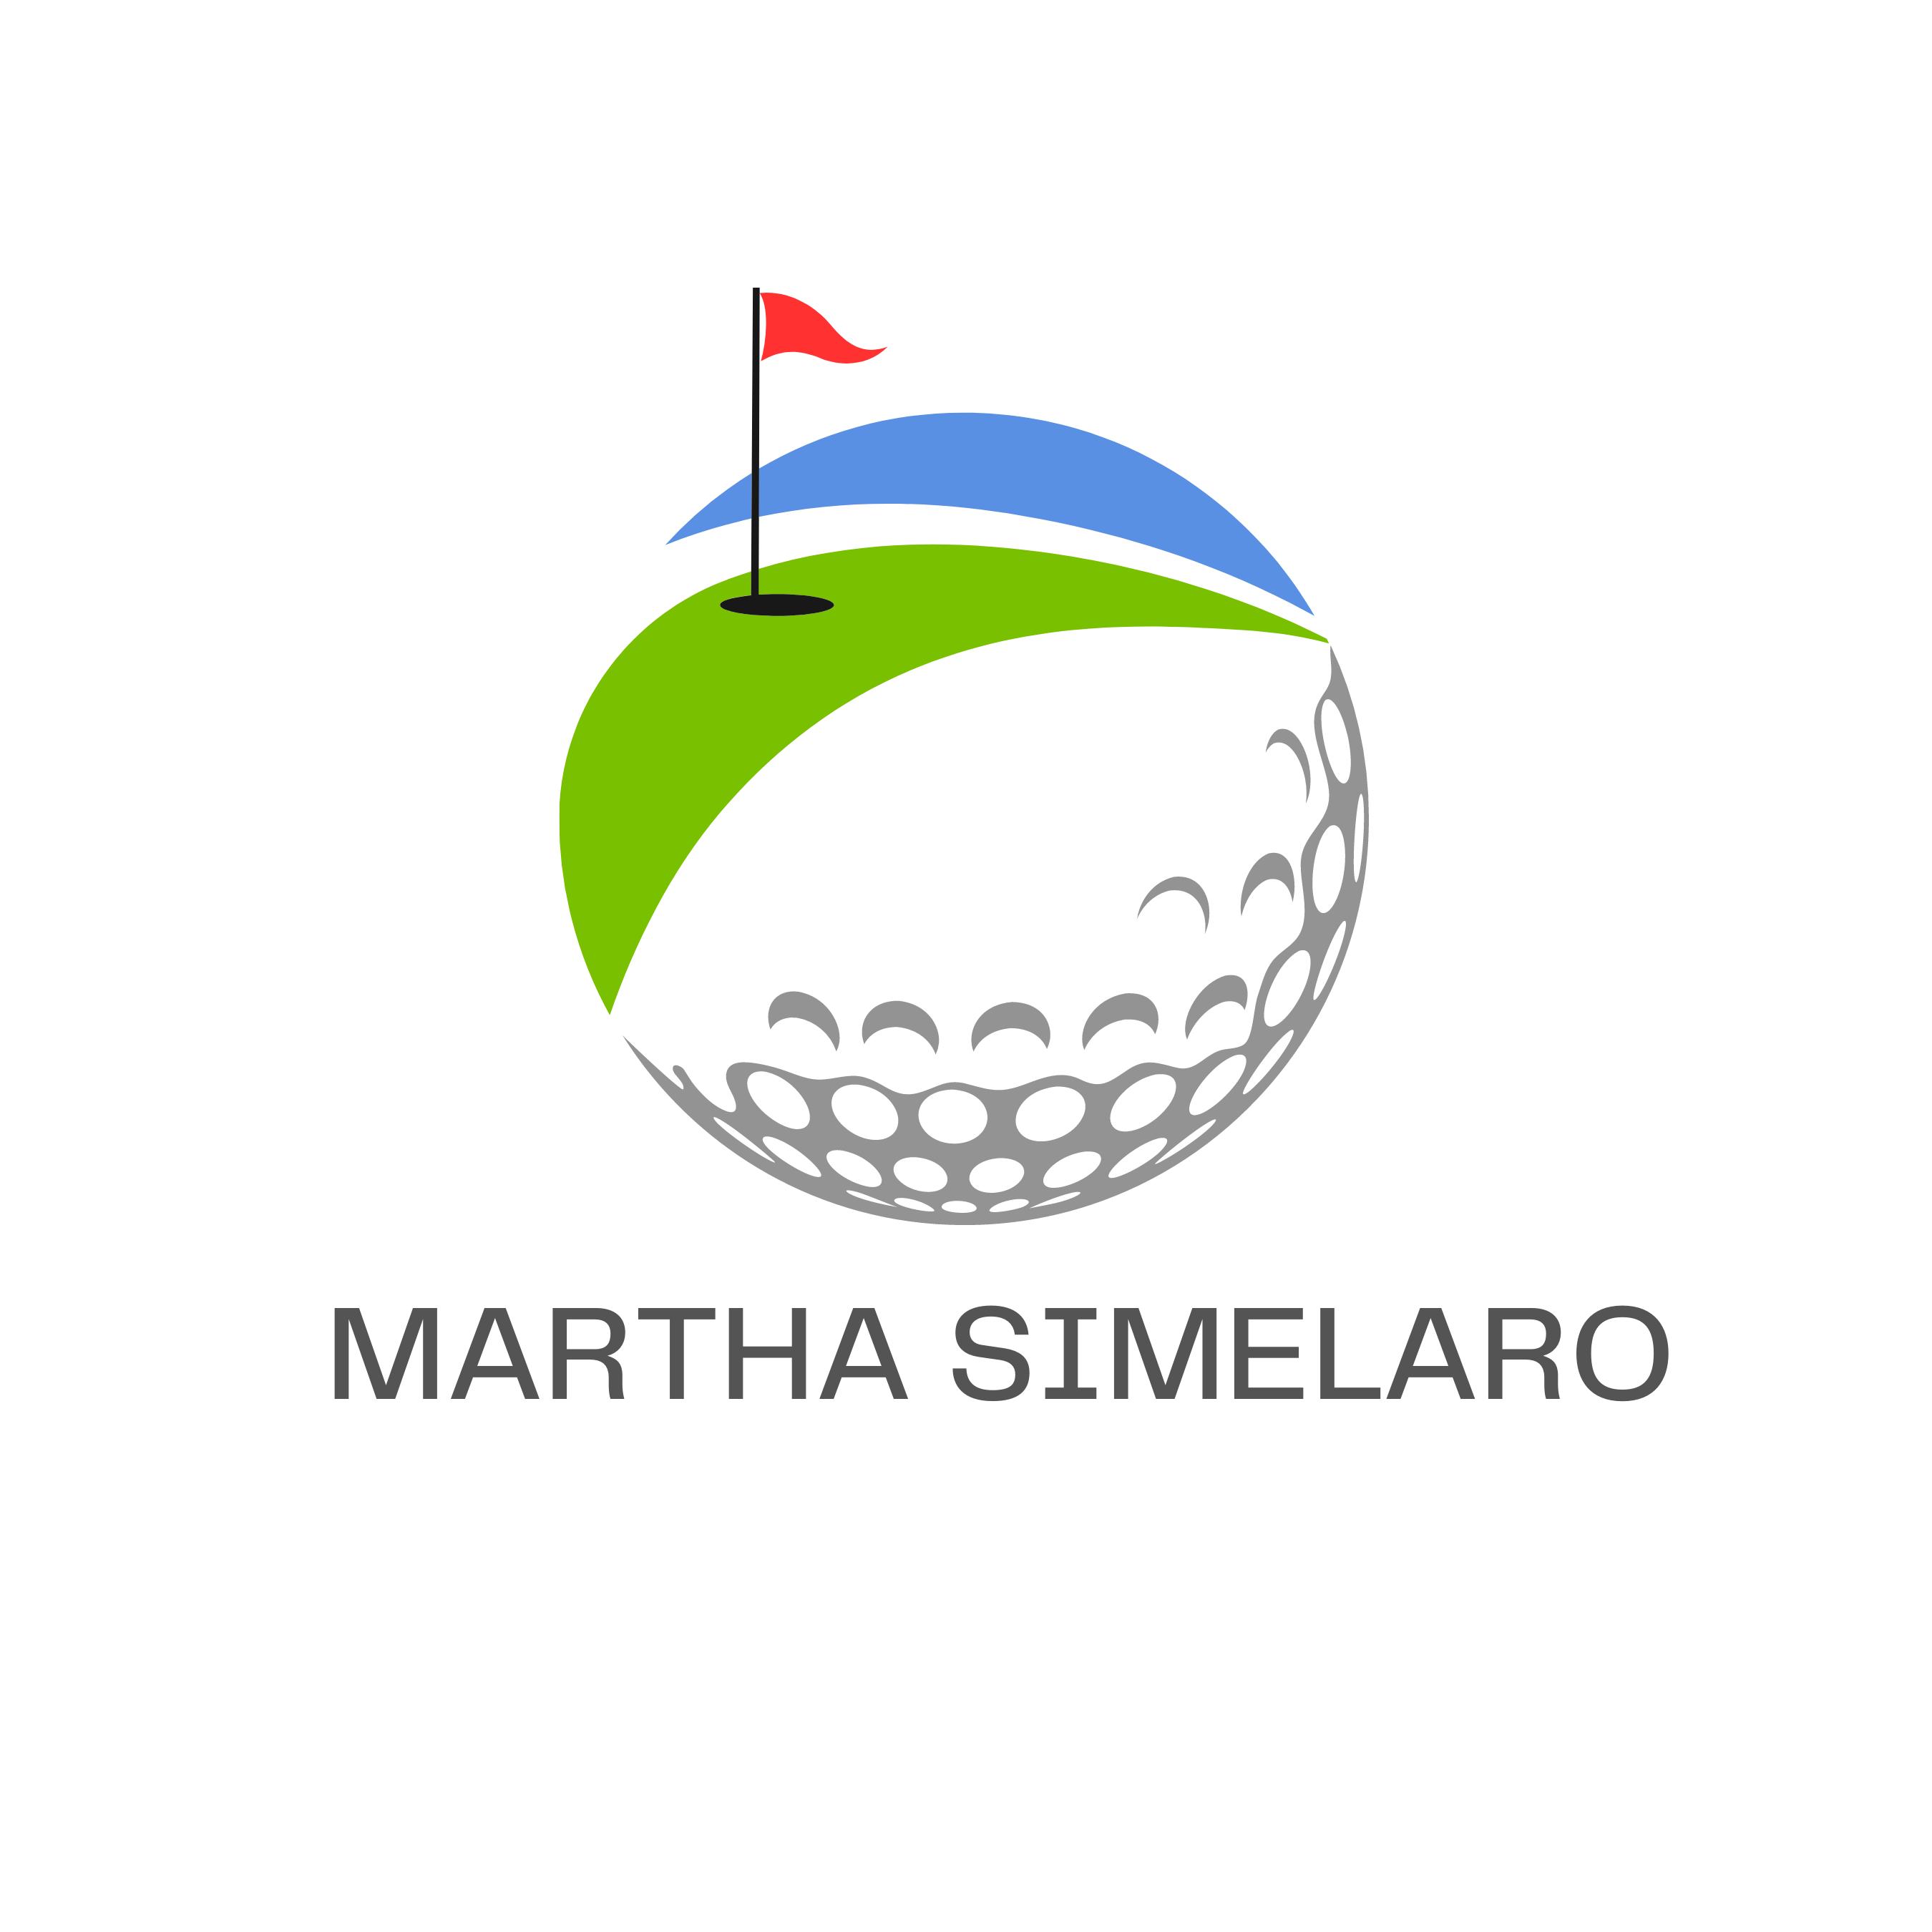 Martha Simelaro